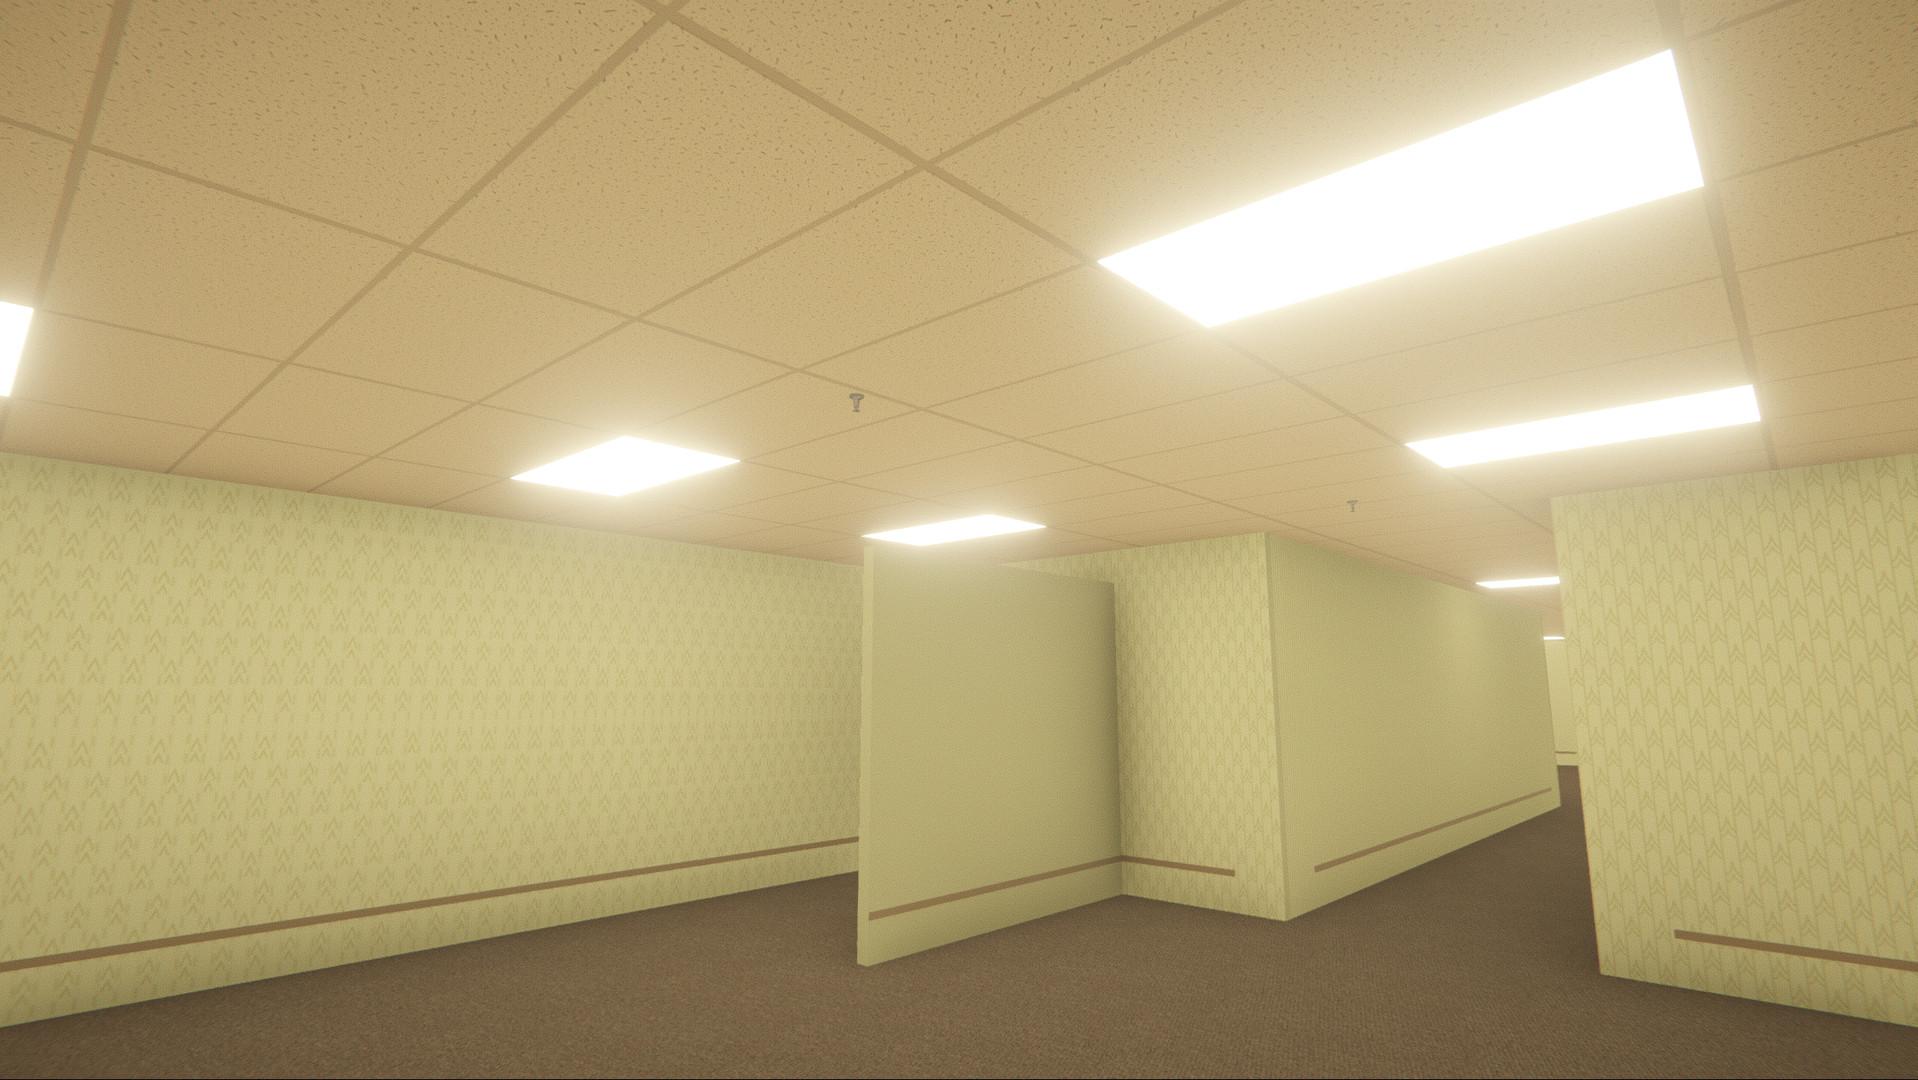 The Backrooms Simulator on Steam